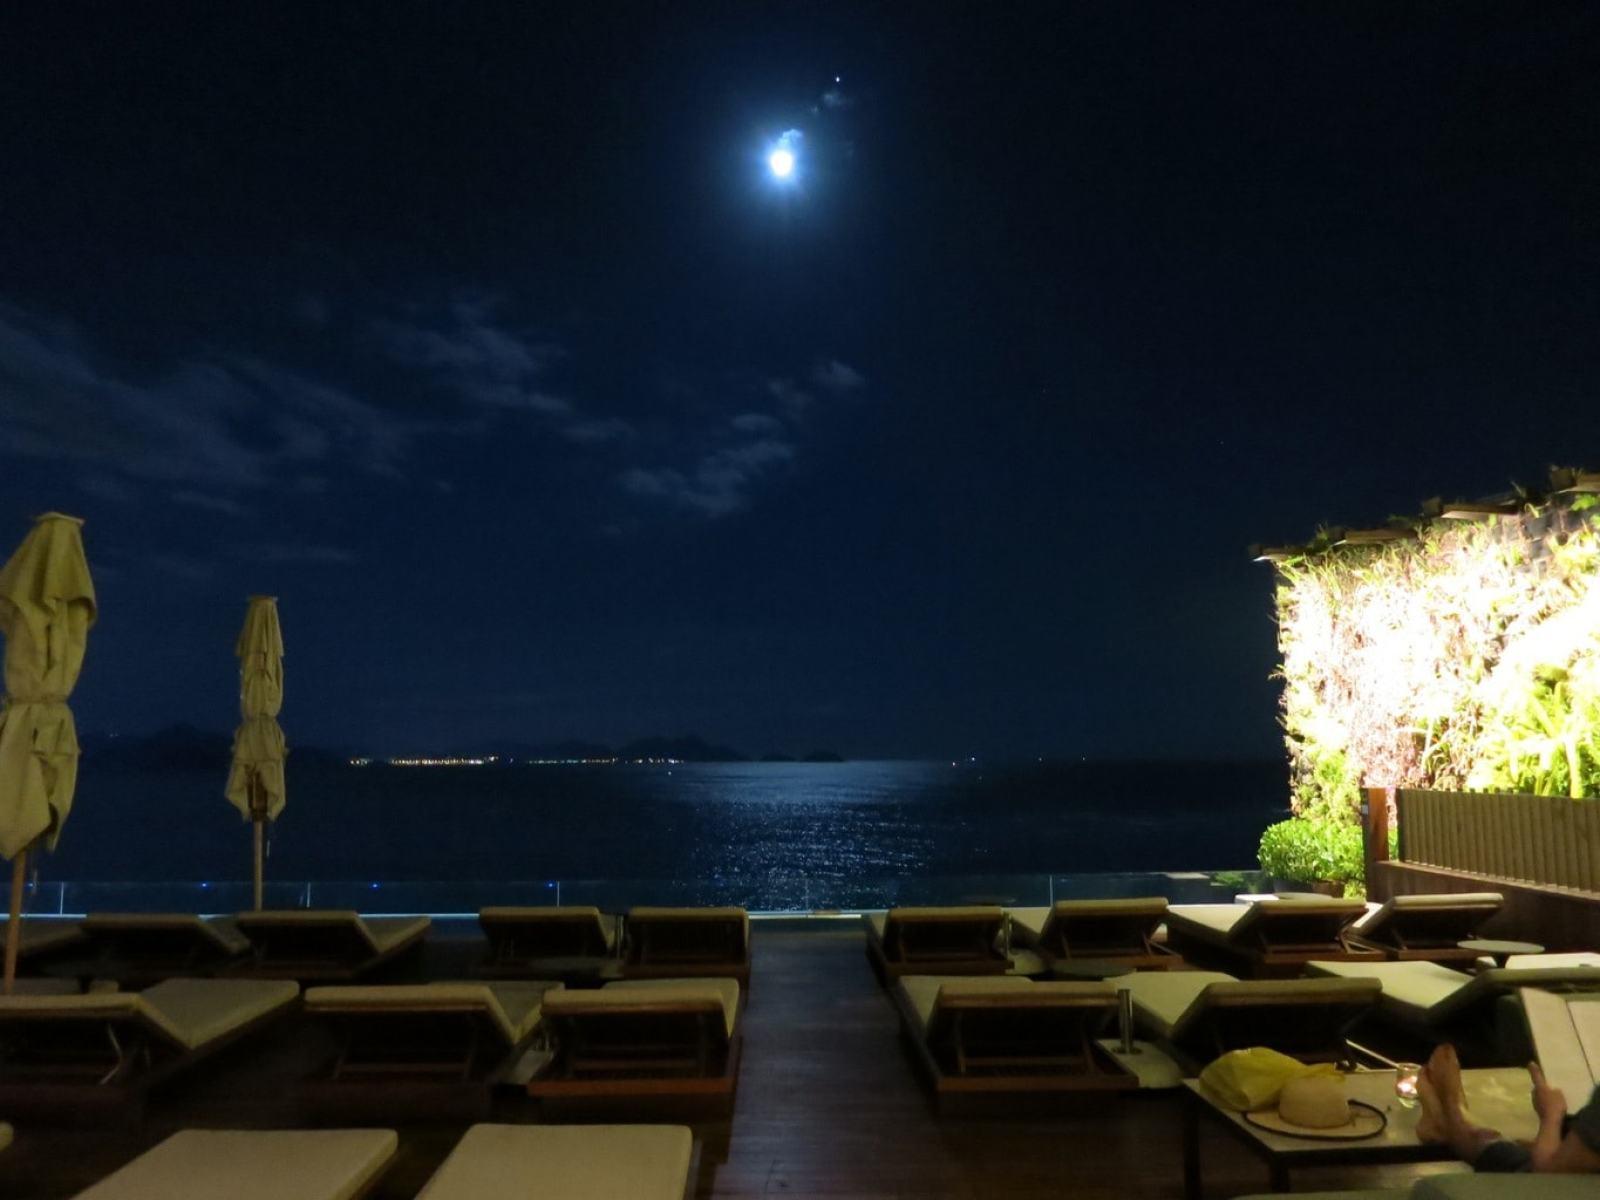 Moonlit Night Hotel Emaliano Rio Brazil